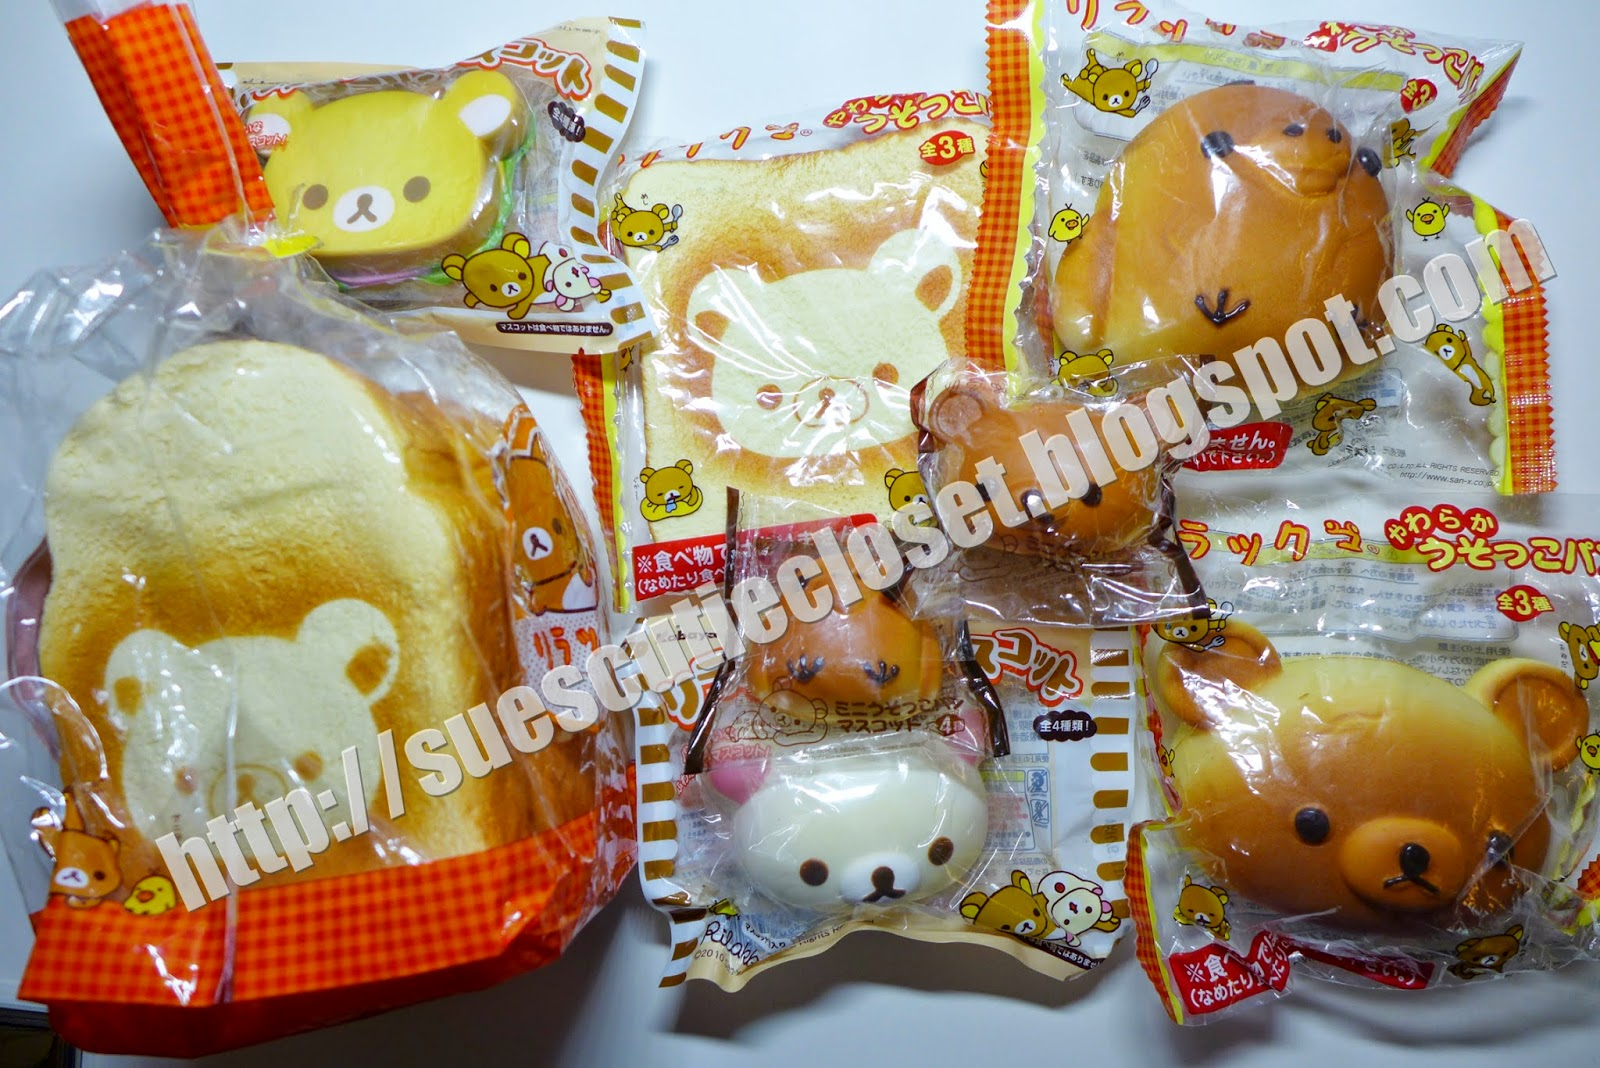 Squishy Collection Blog : Sue s Cutie Closet : Squishy Haul Close-Up: Rilakkuma Bread Bun Squishy Collection